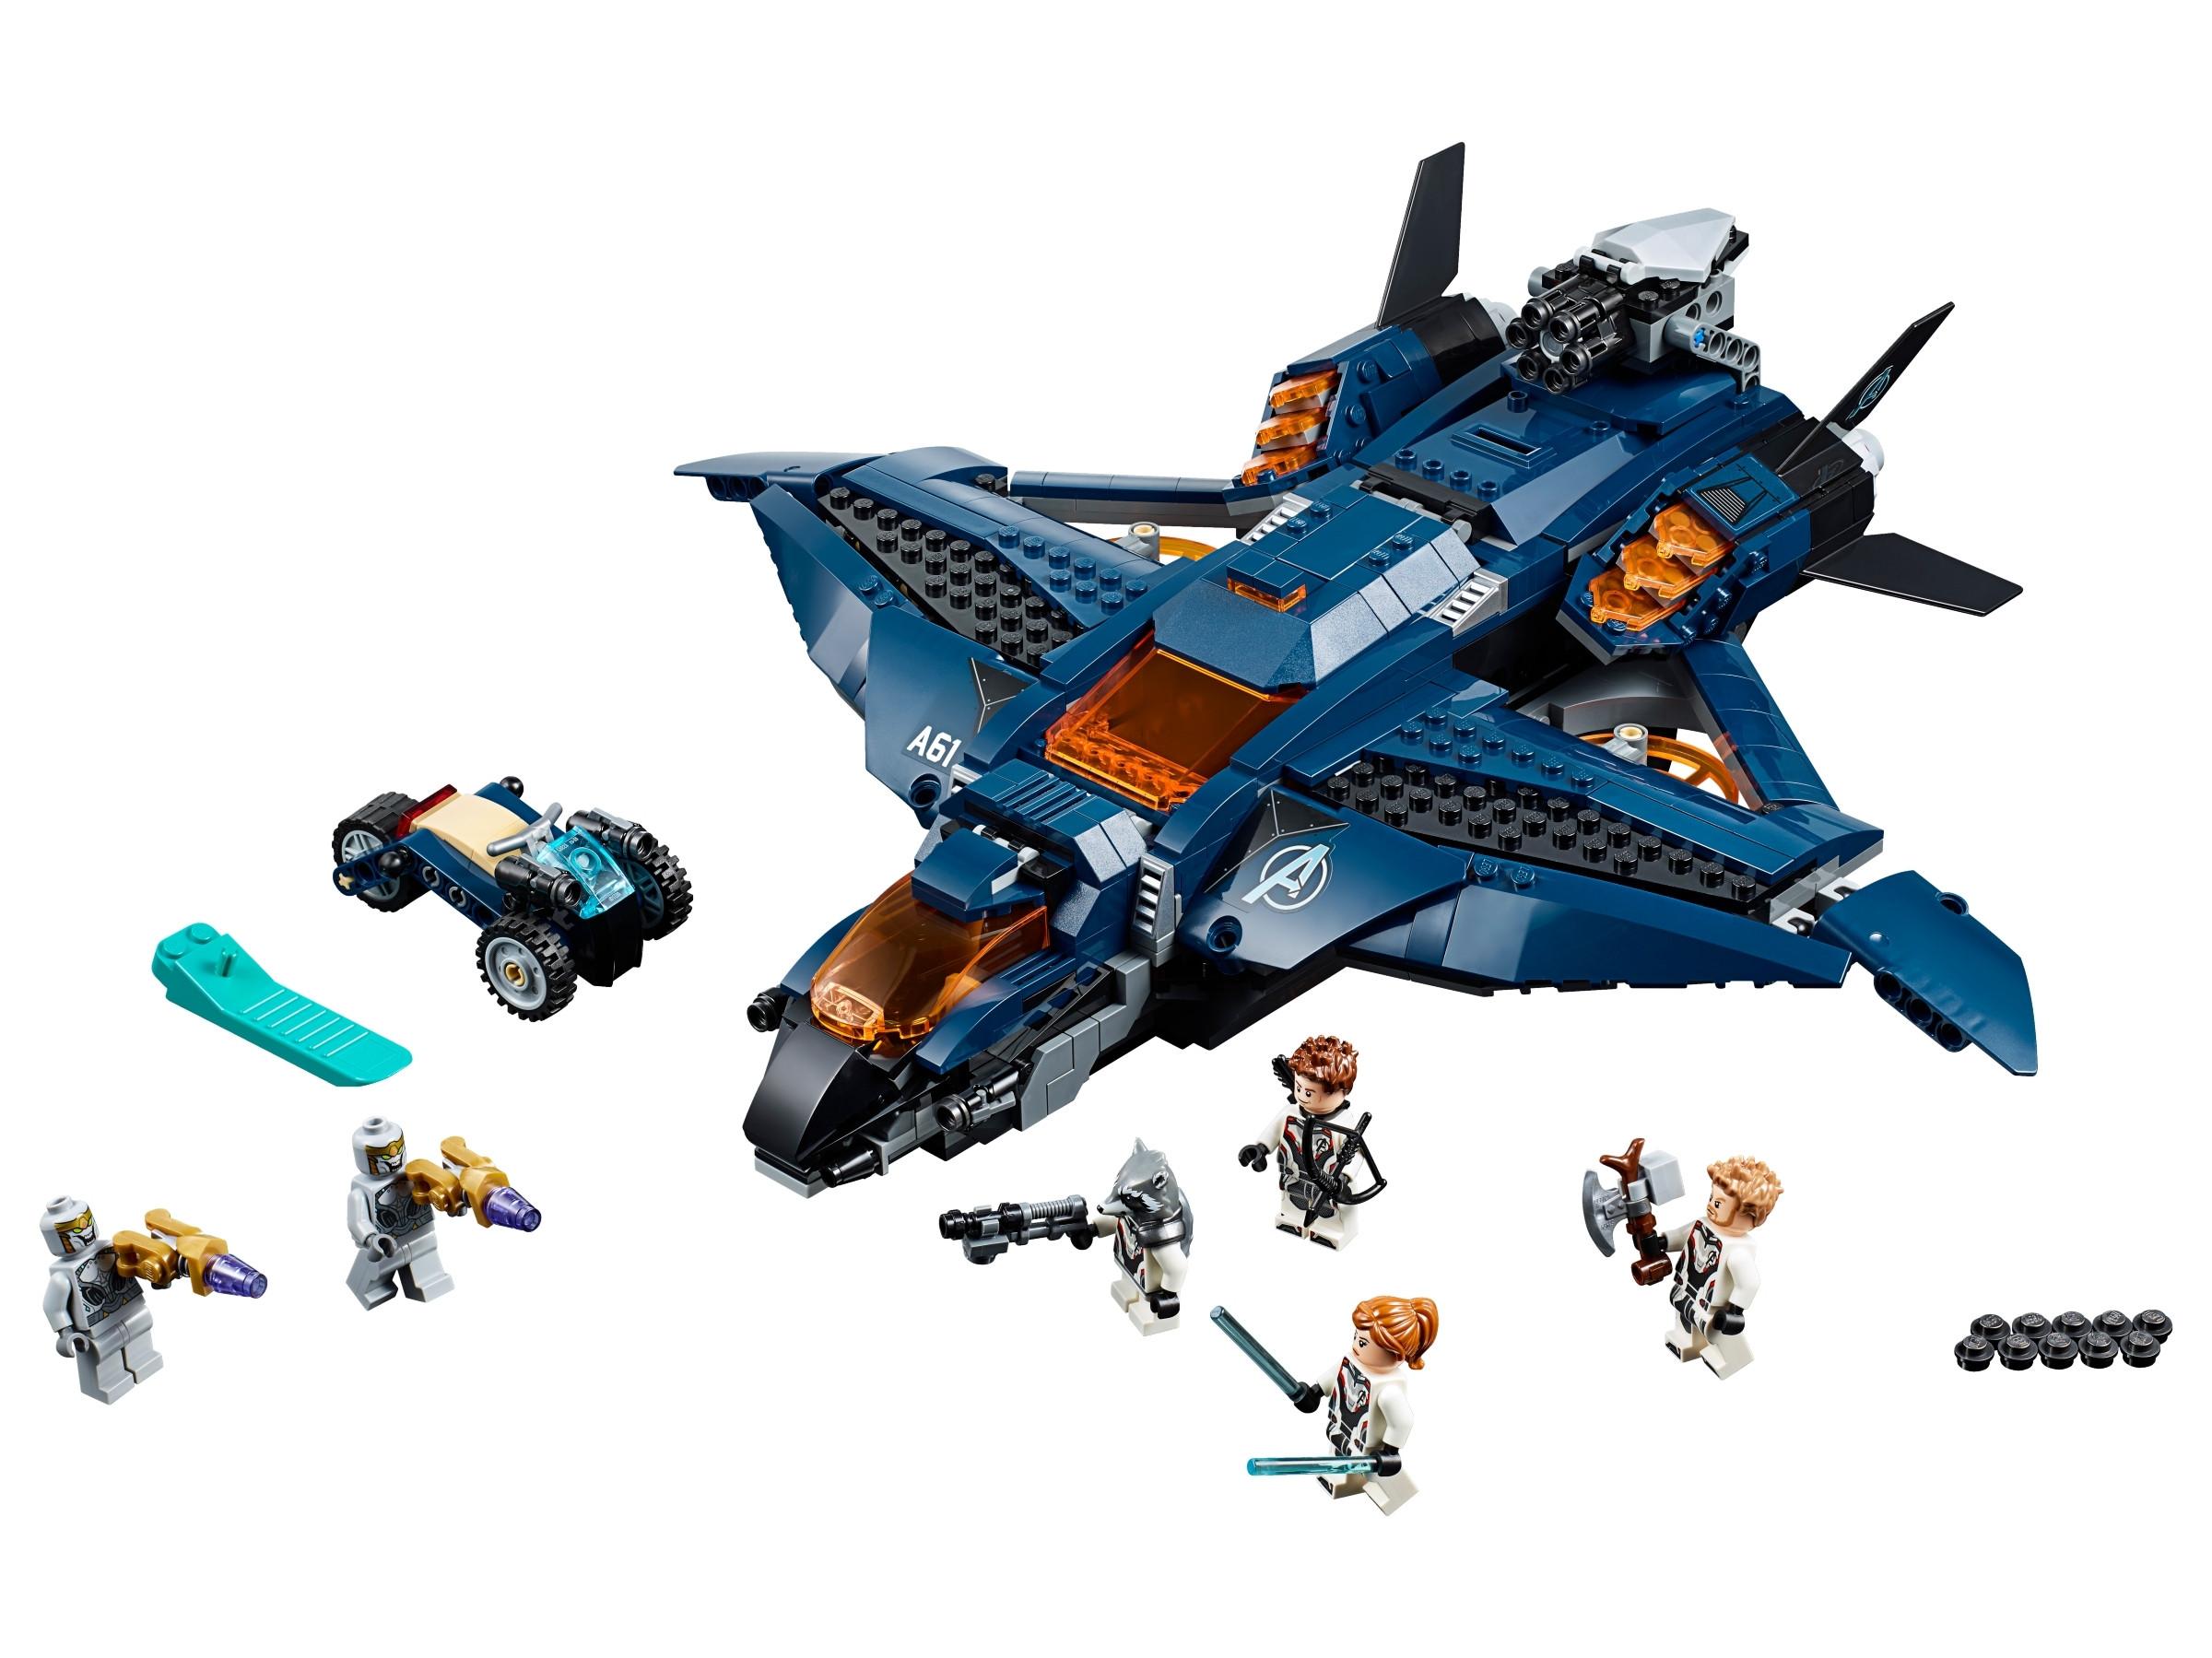 Lego Avengers' ultimative quinjet